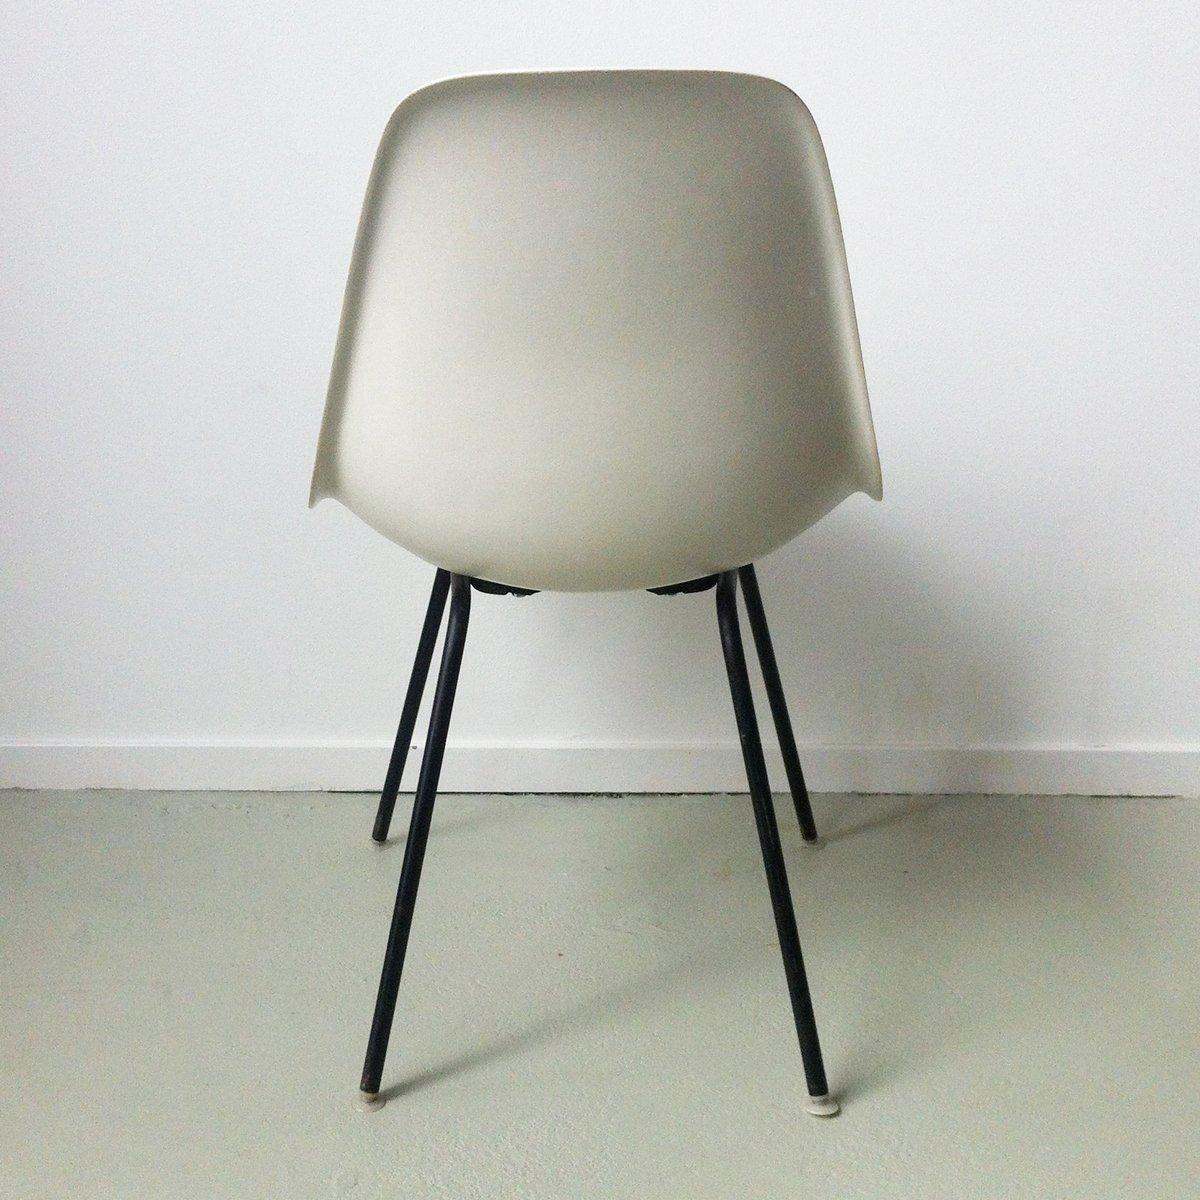 dsx stuhl von charles ray eames f r herman miller bei. Black Bedroom Furniture Sets. Home Design Ideas